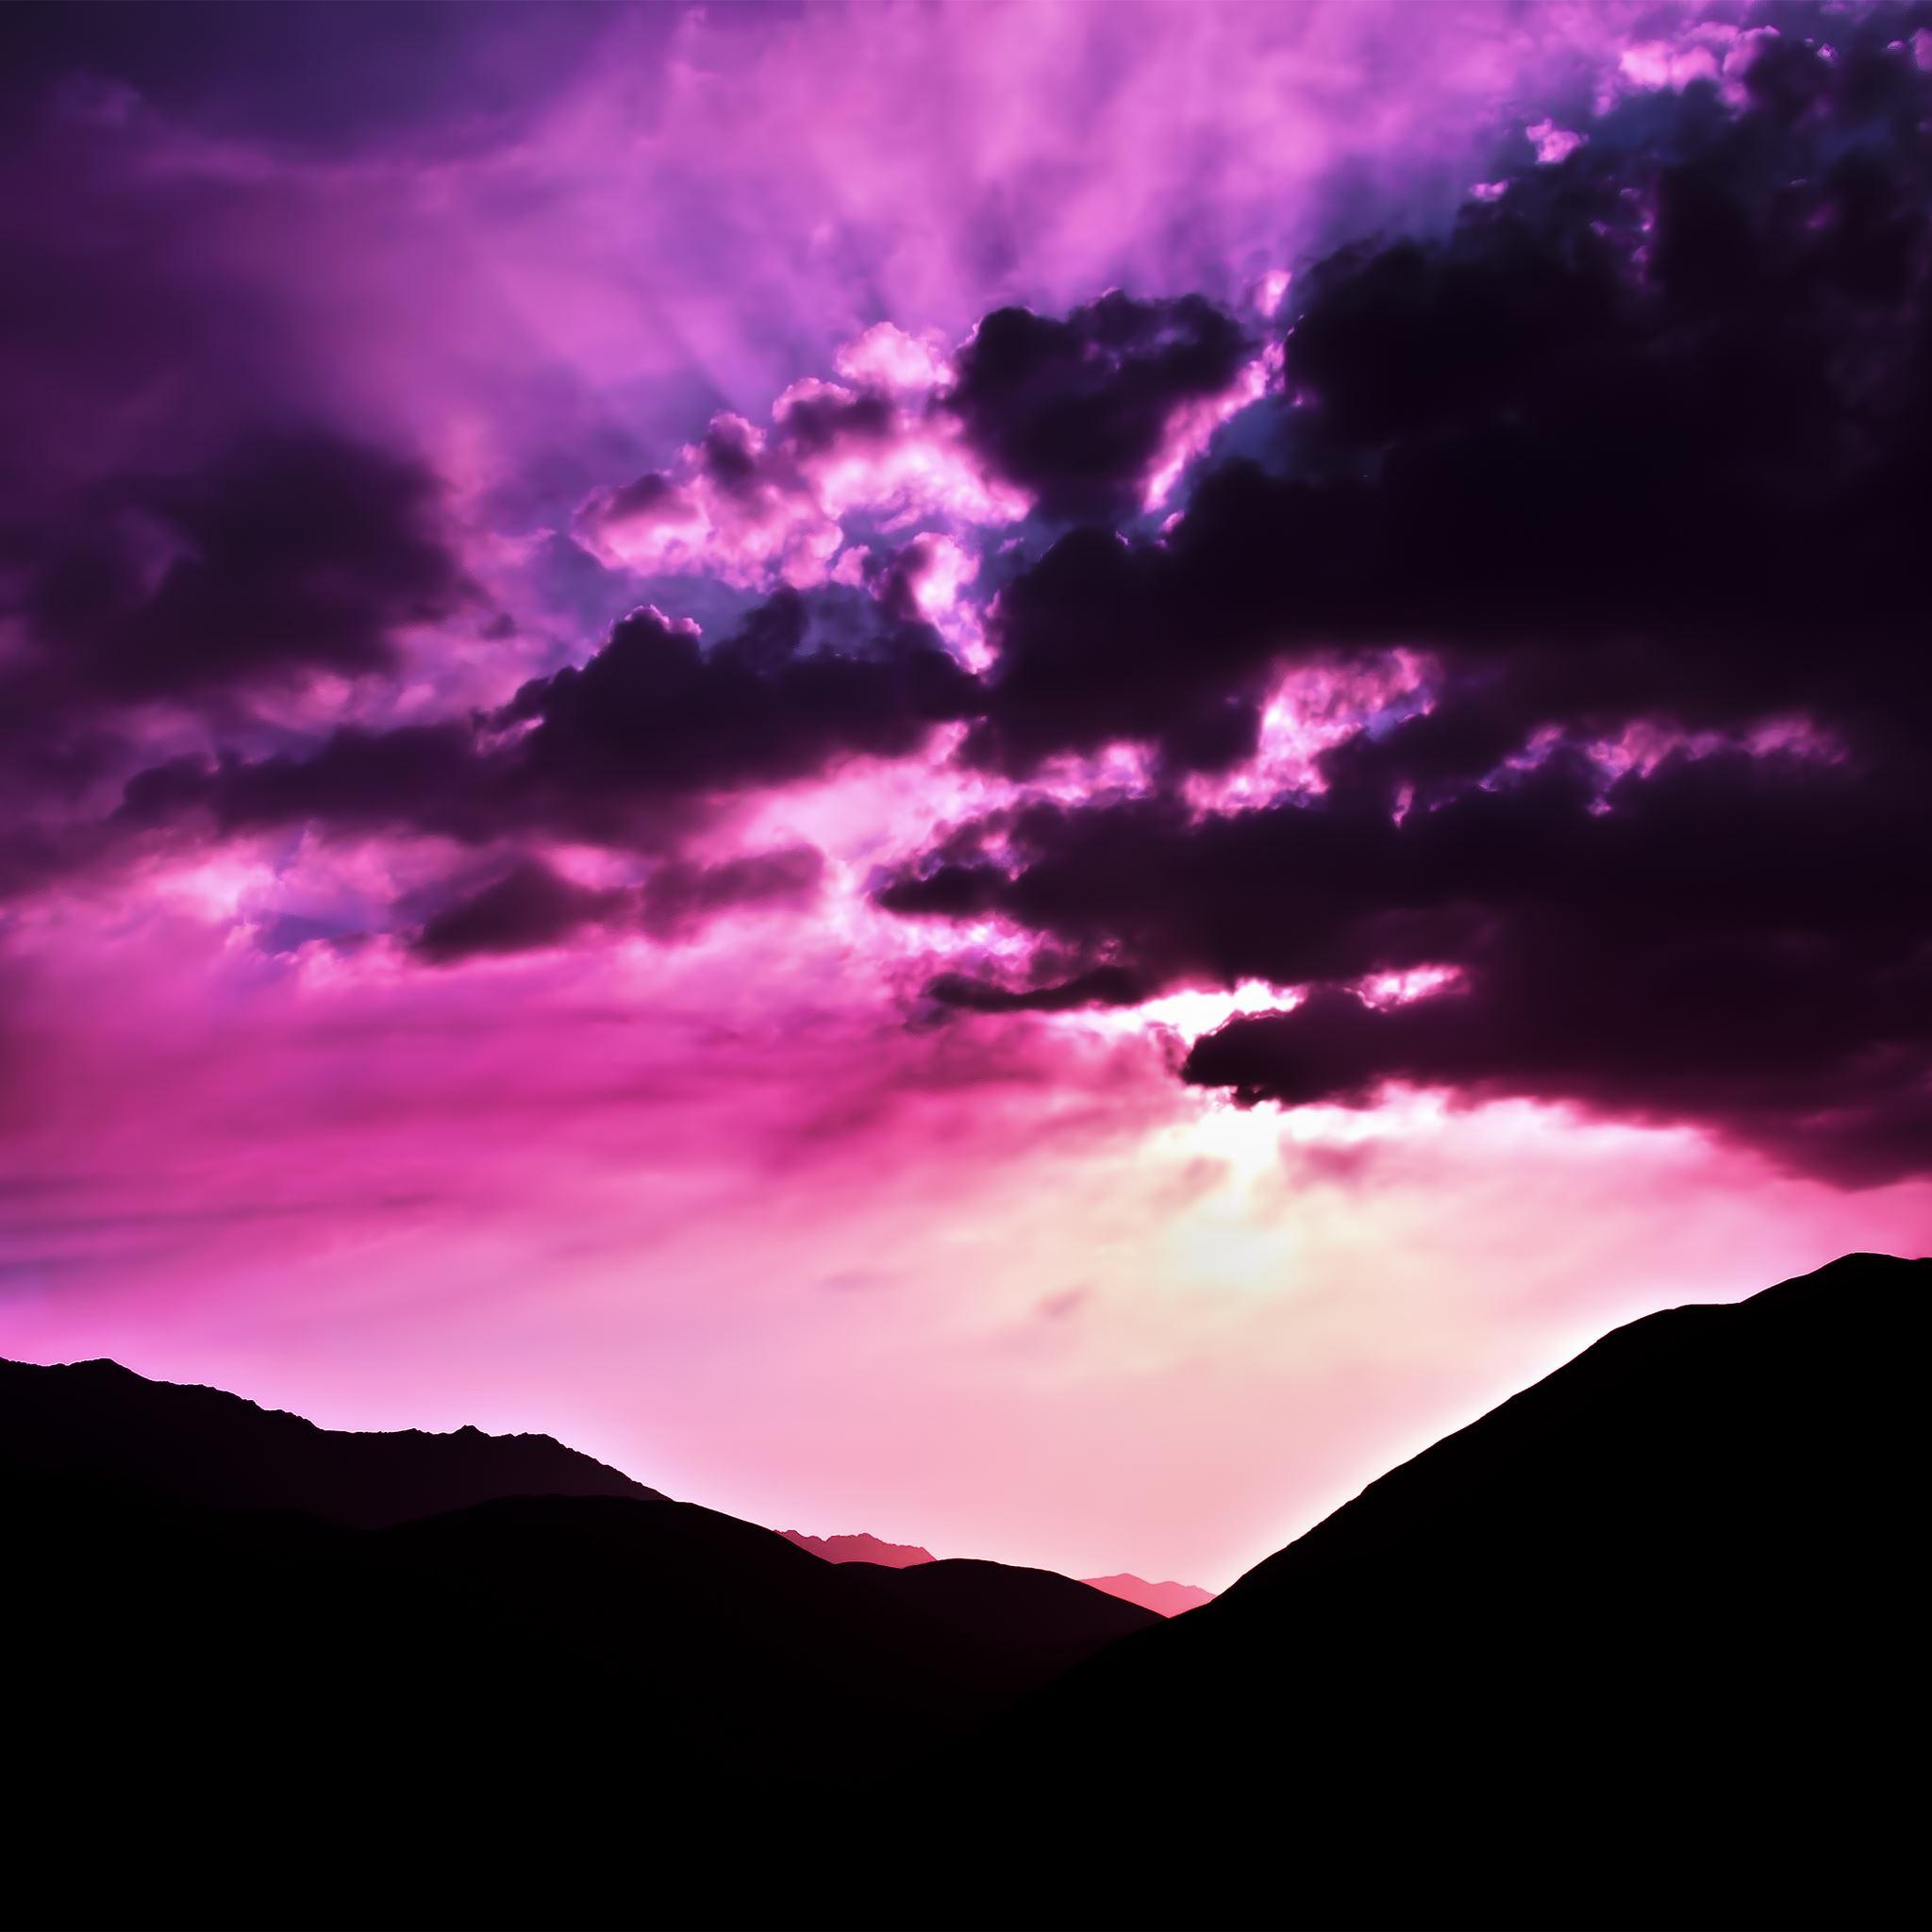 Wallpaper Iphone Violet: Purple Morning IPad Air Wallpaper Download